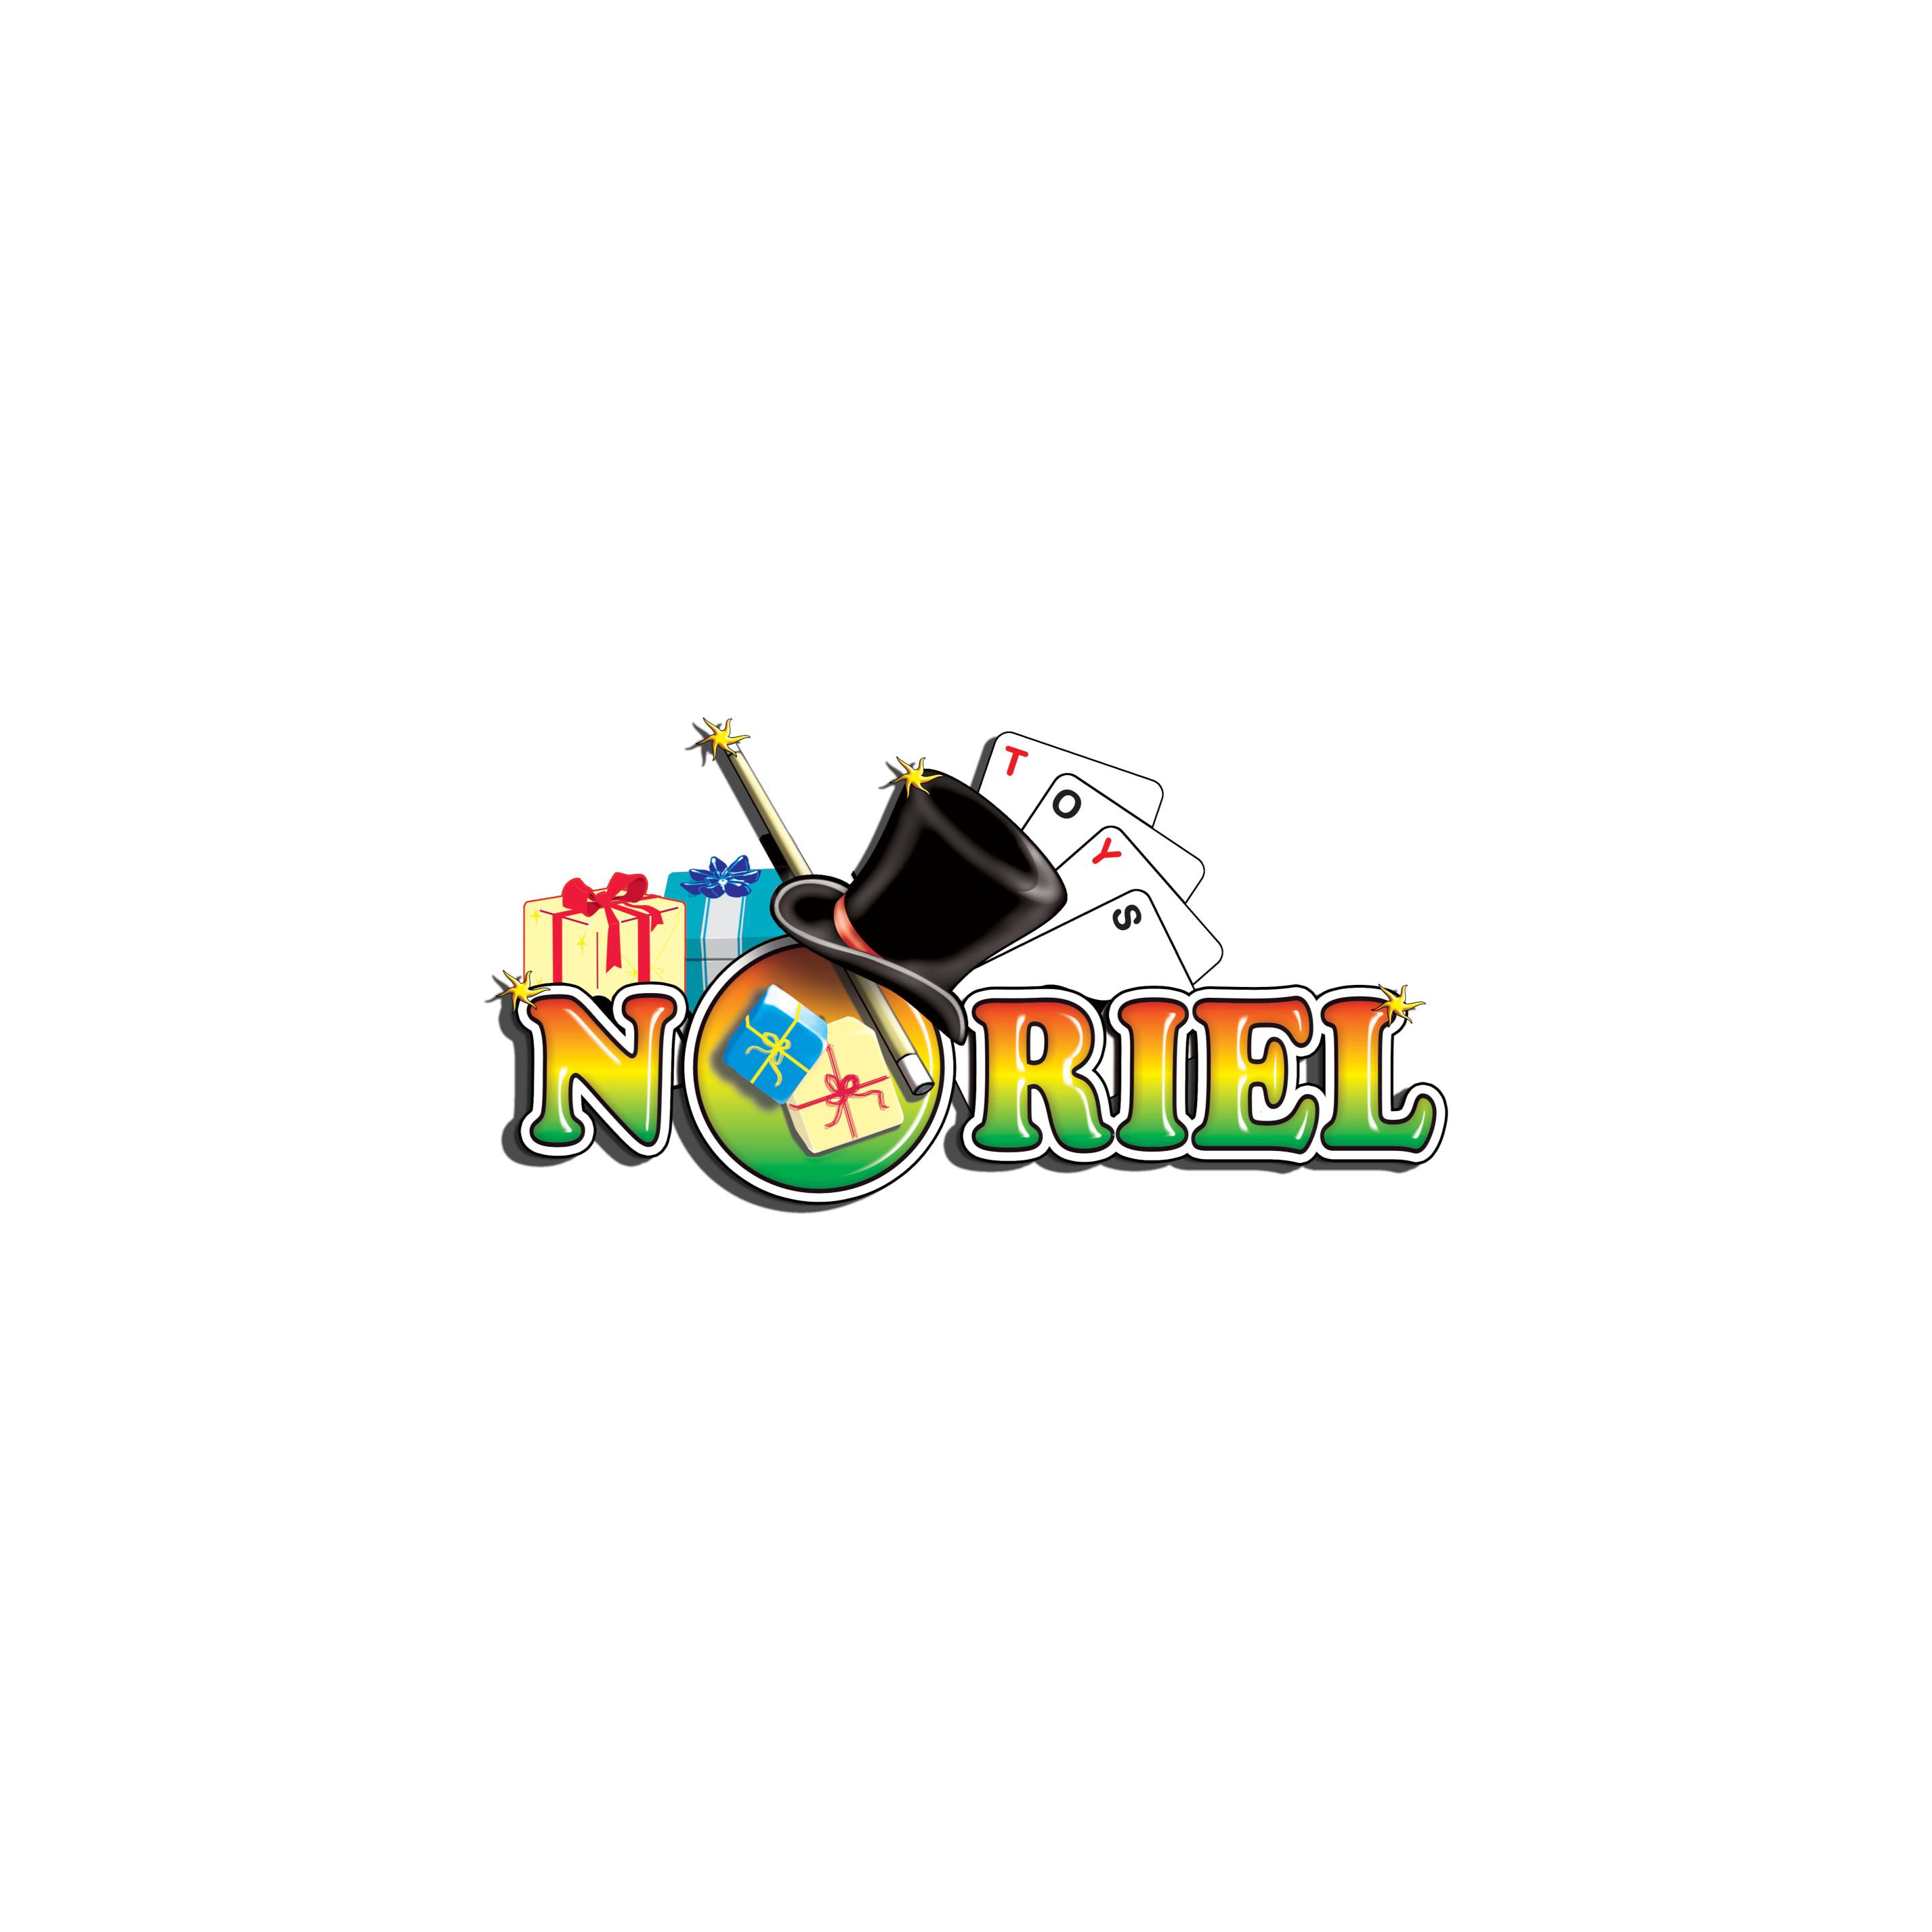 Figurina articulata My Little Pony - Applejack pictorita